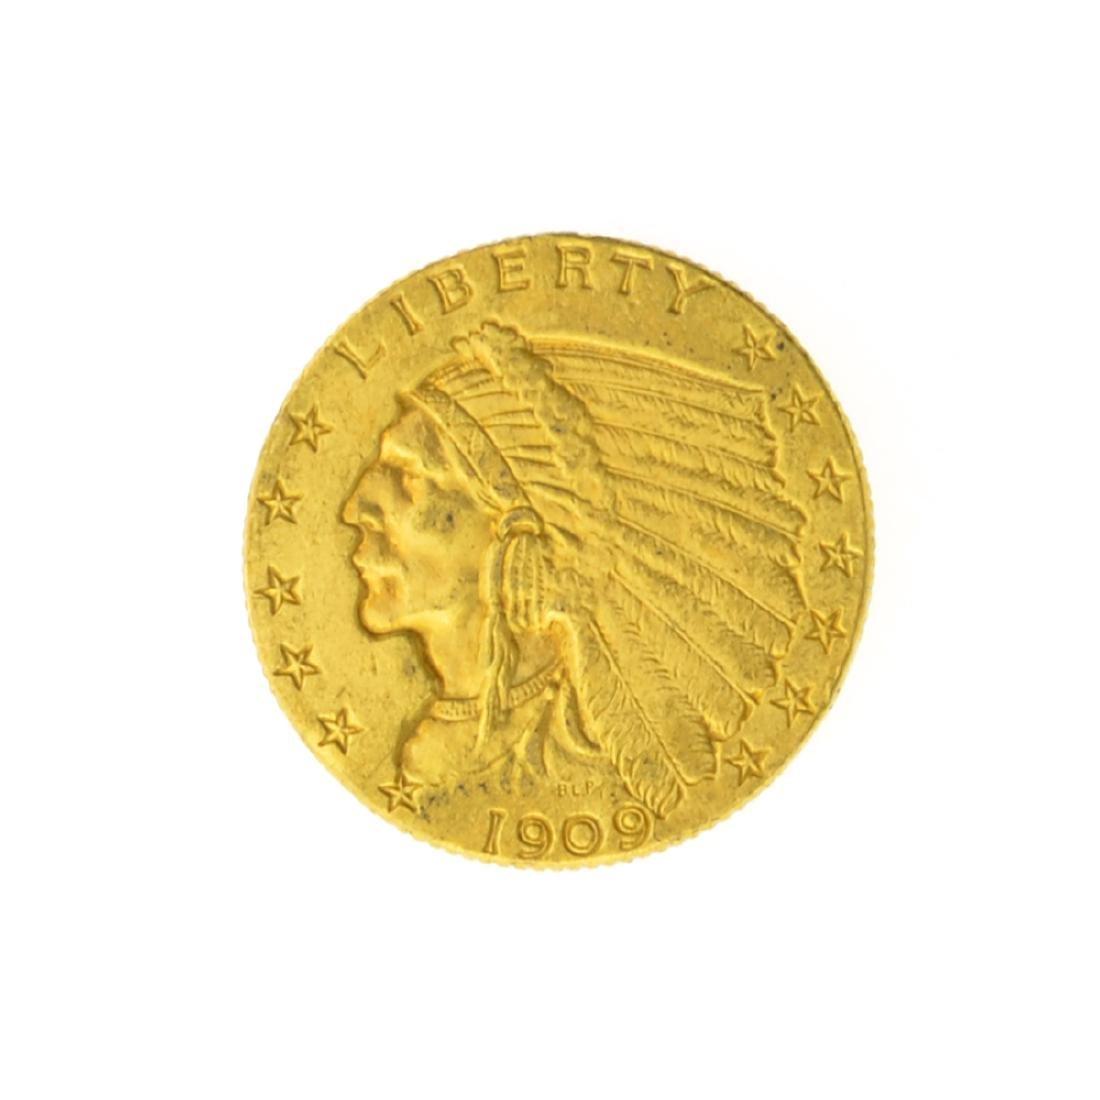 *1909 $2.50 U.S. Indian Head Gold Coin (JG)